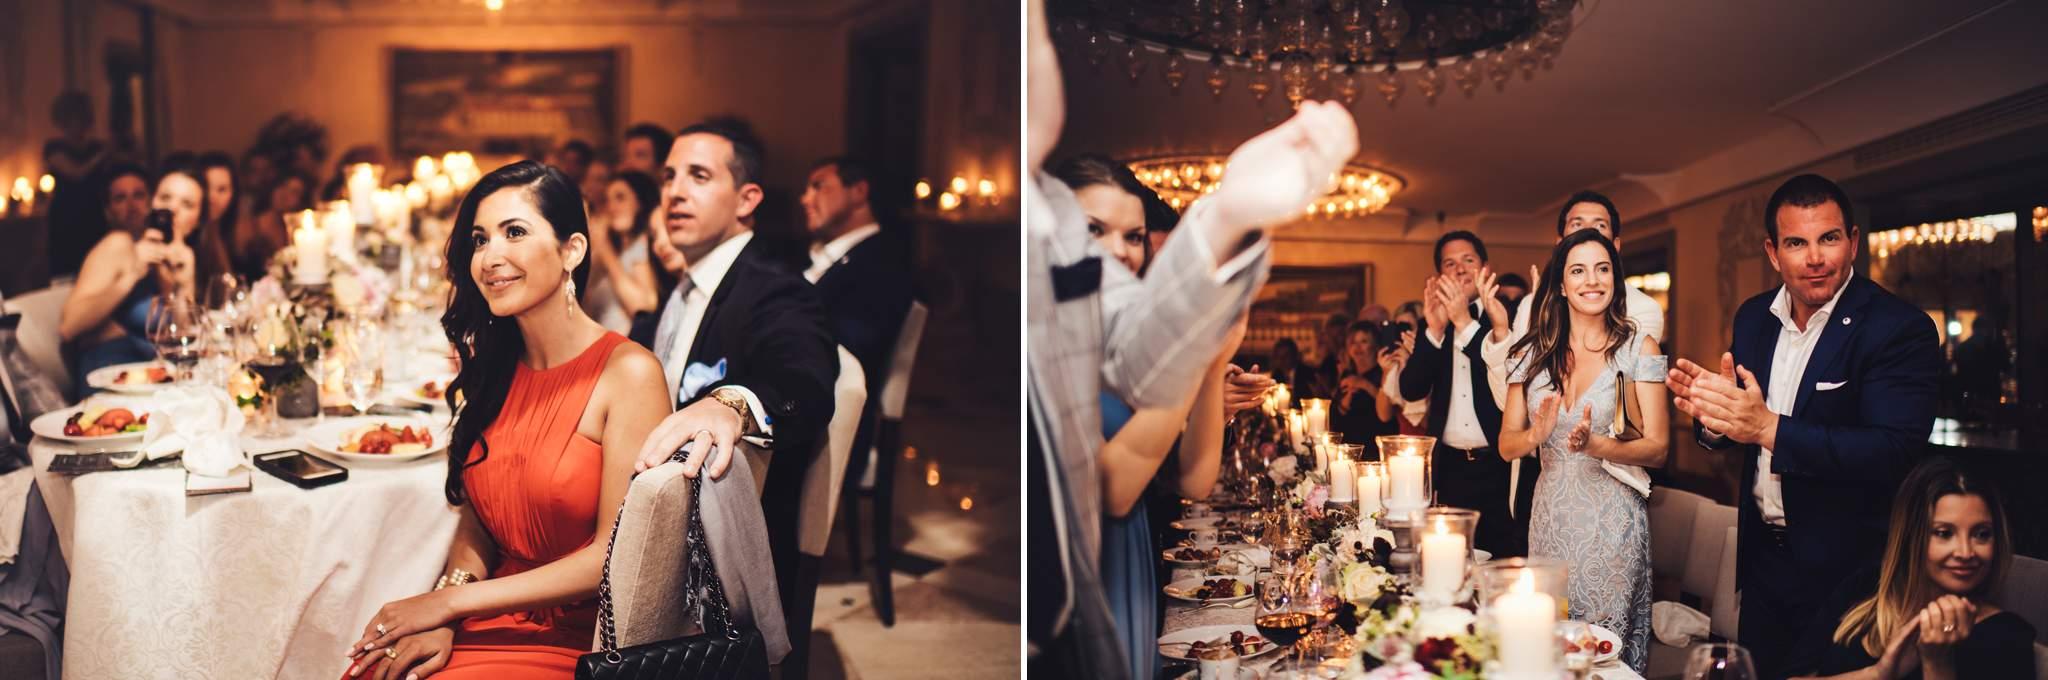 49wedding-photographer-belmond-san-michele-florence